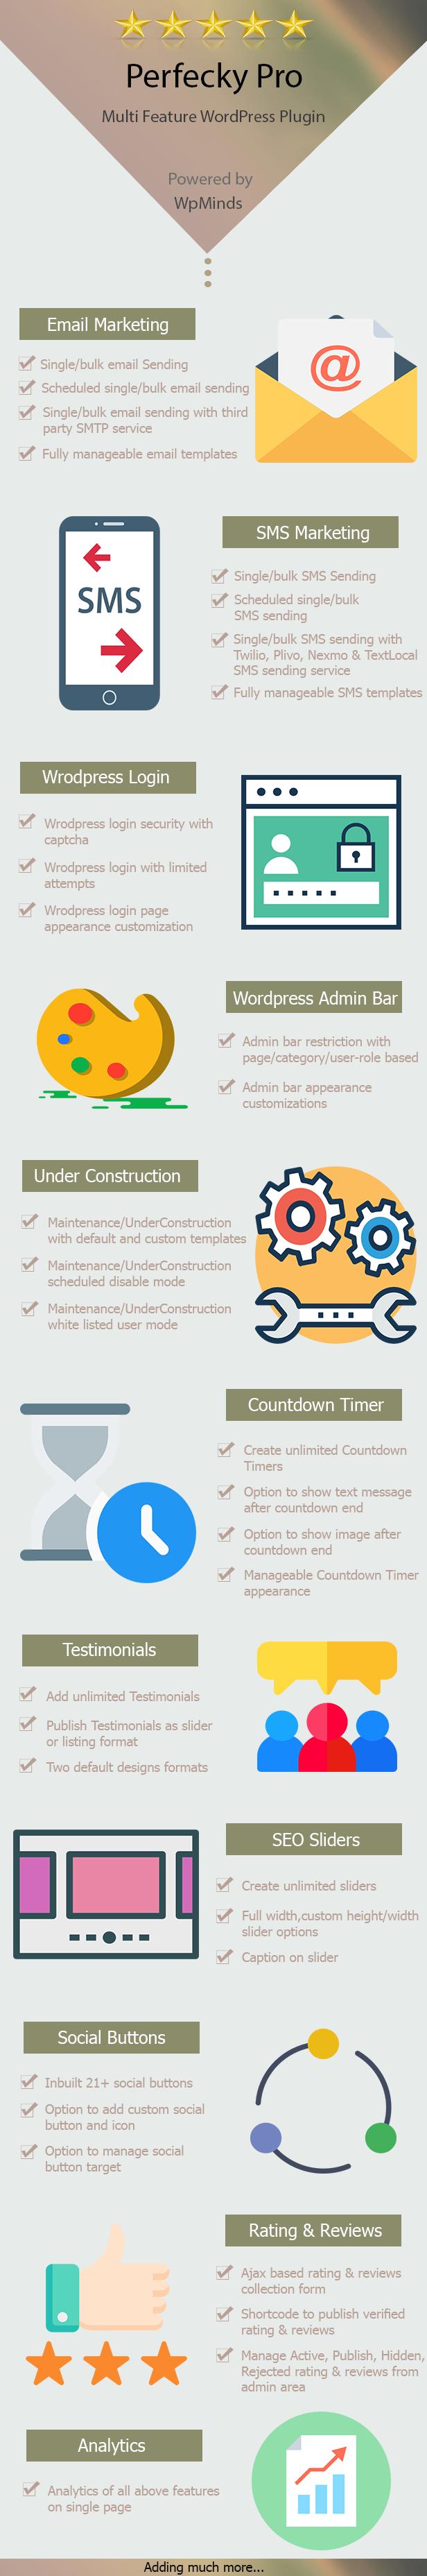 Perfecky Pro - Multi Features WordPress Plugin, Email Marketing, SMS Marketing, Wrodpress Login, WordPress Admin Bar, Maintenance/UnderConstruction, Countdown Timer, Testimonials, Sliders, Social Buttons, Rating & Reviews, Analytics